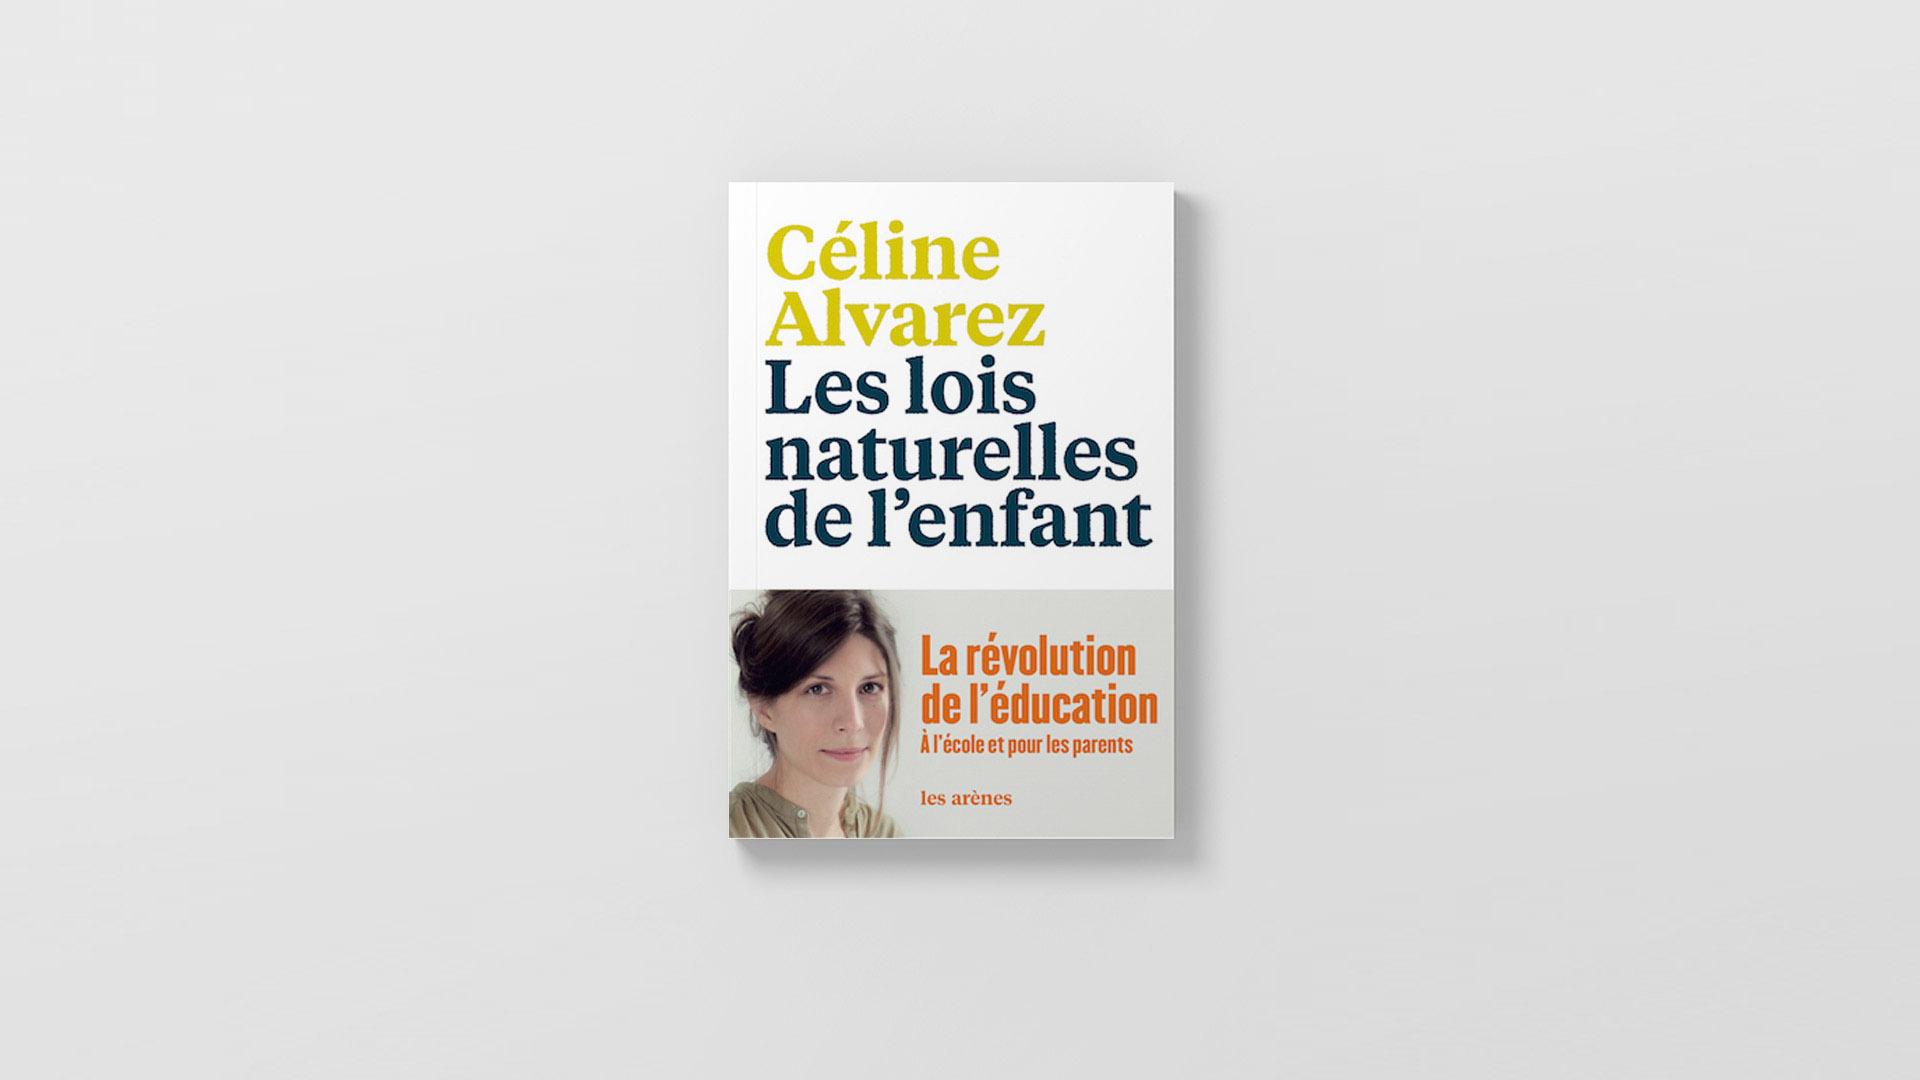 Céline Alvarez, une nature inspirante